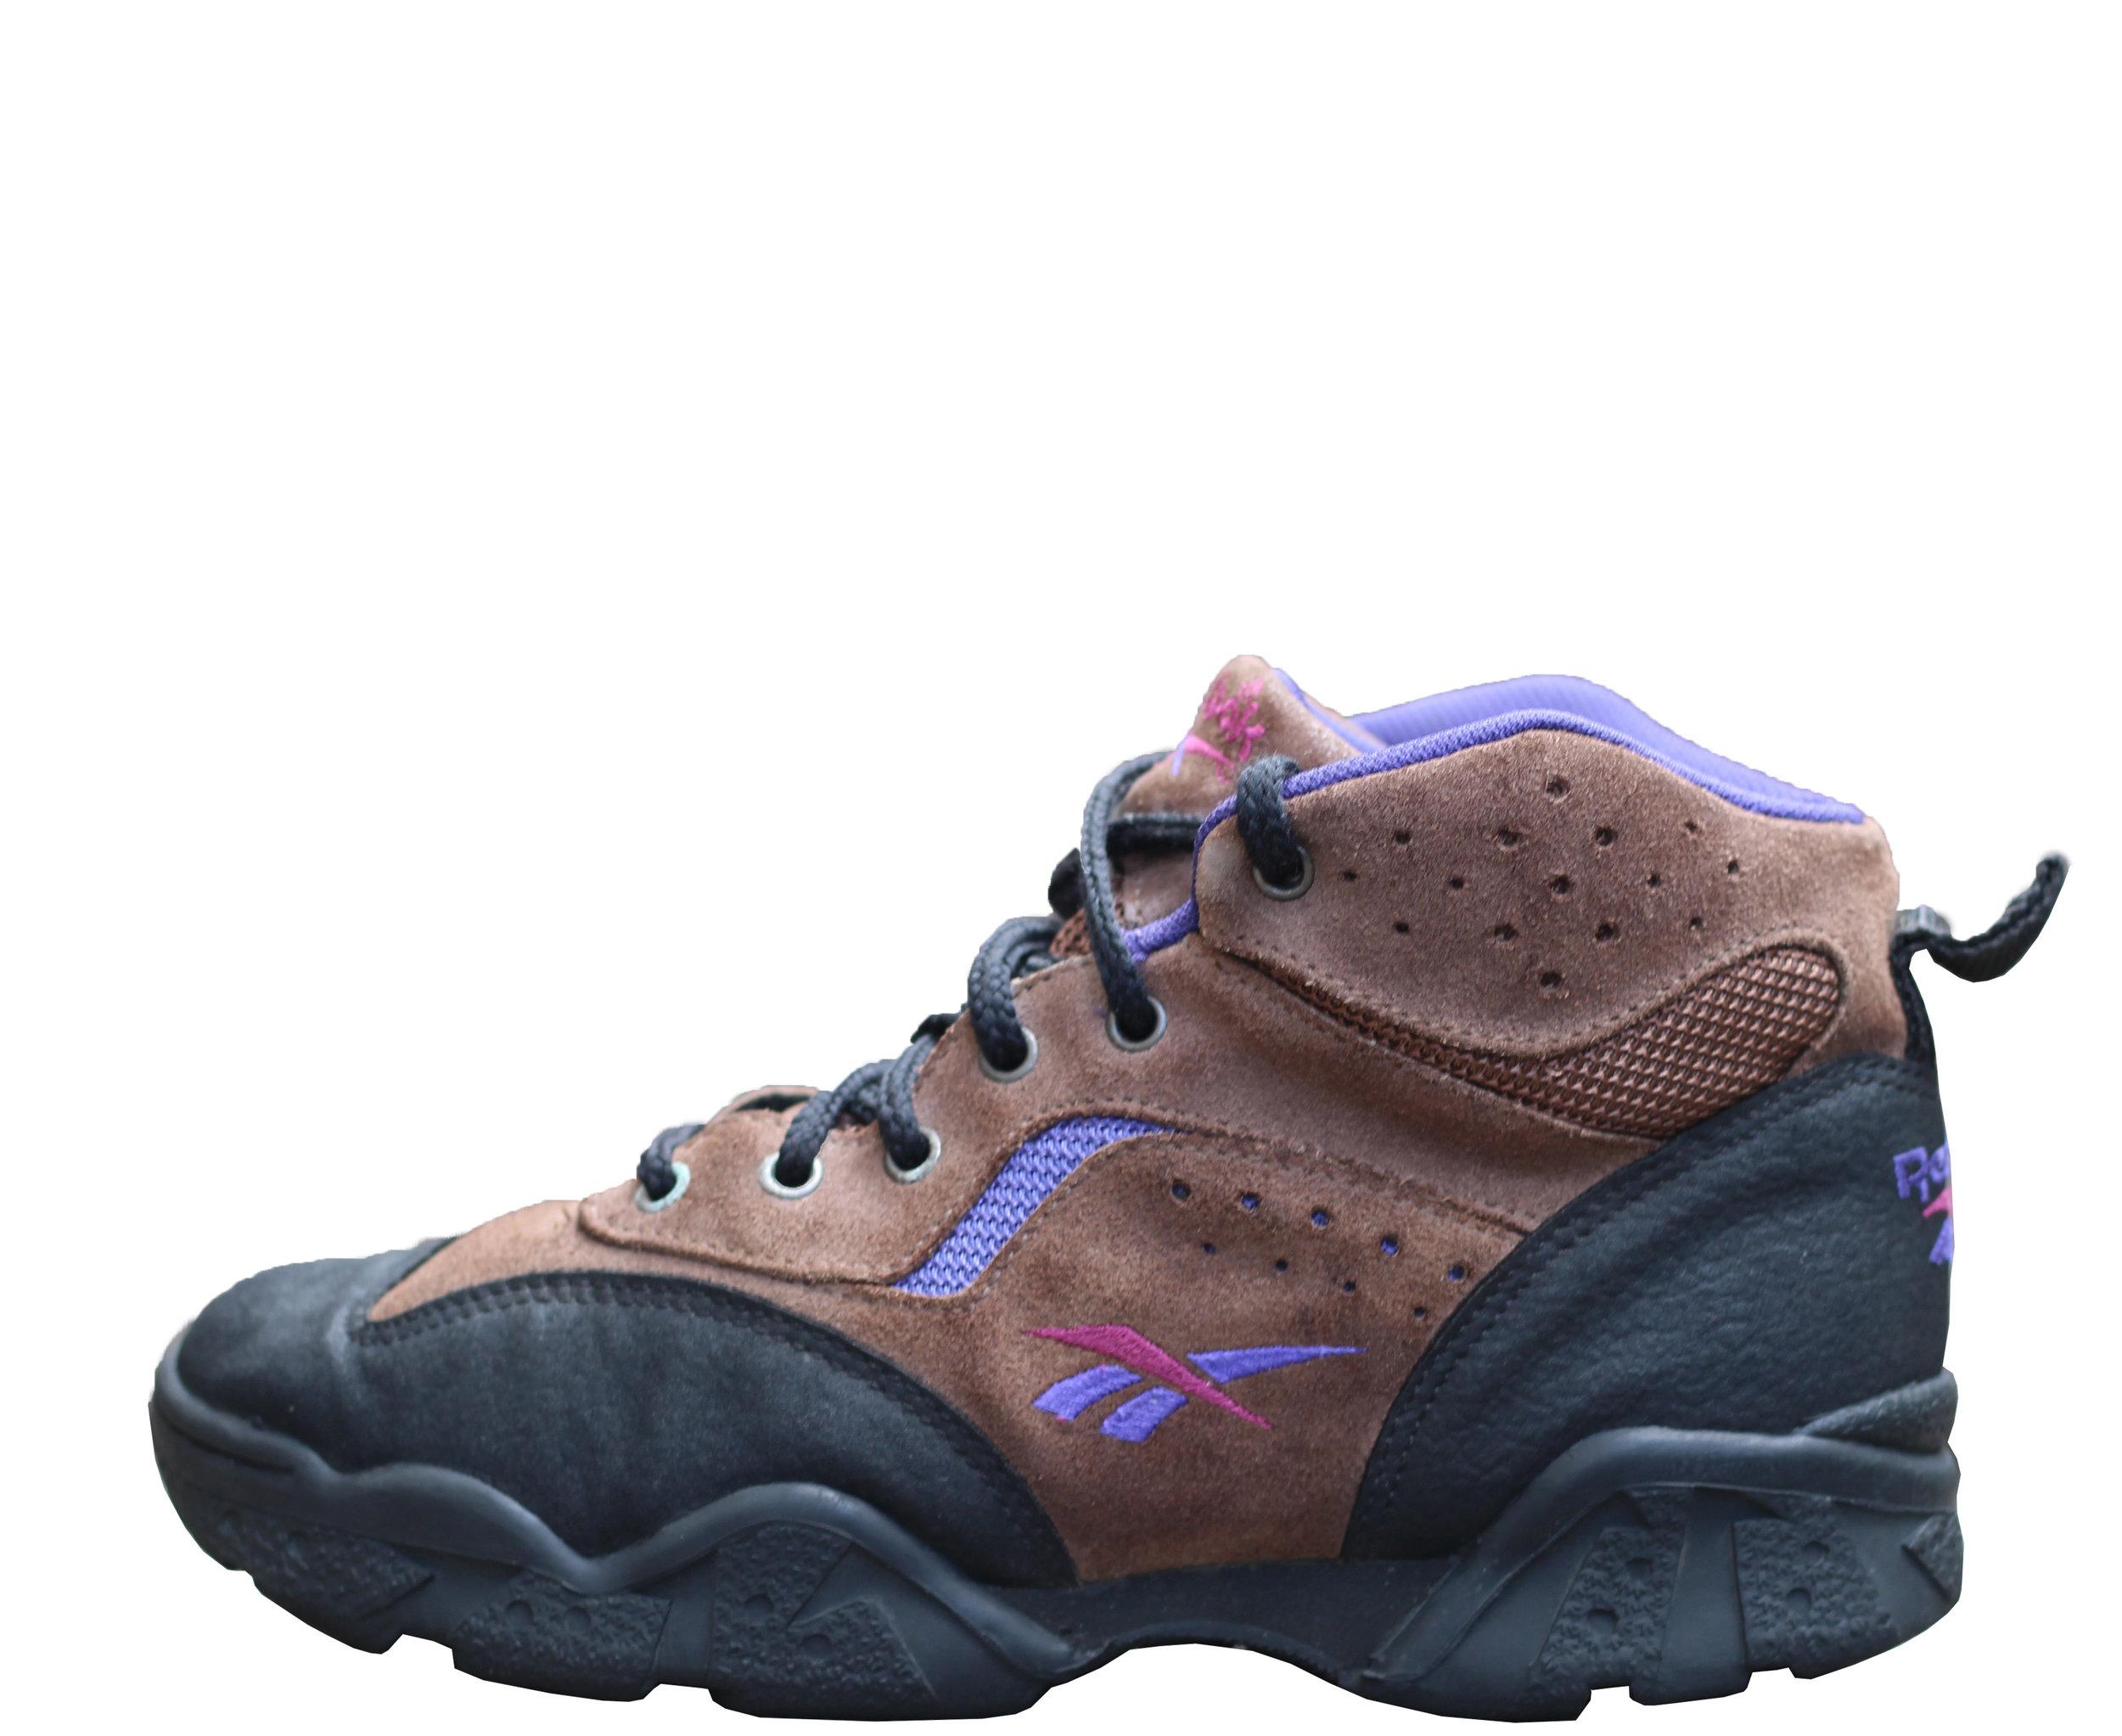 reebok women's hiking boots - 59% OFF